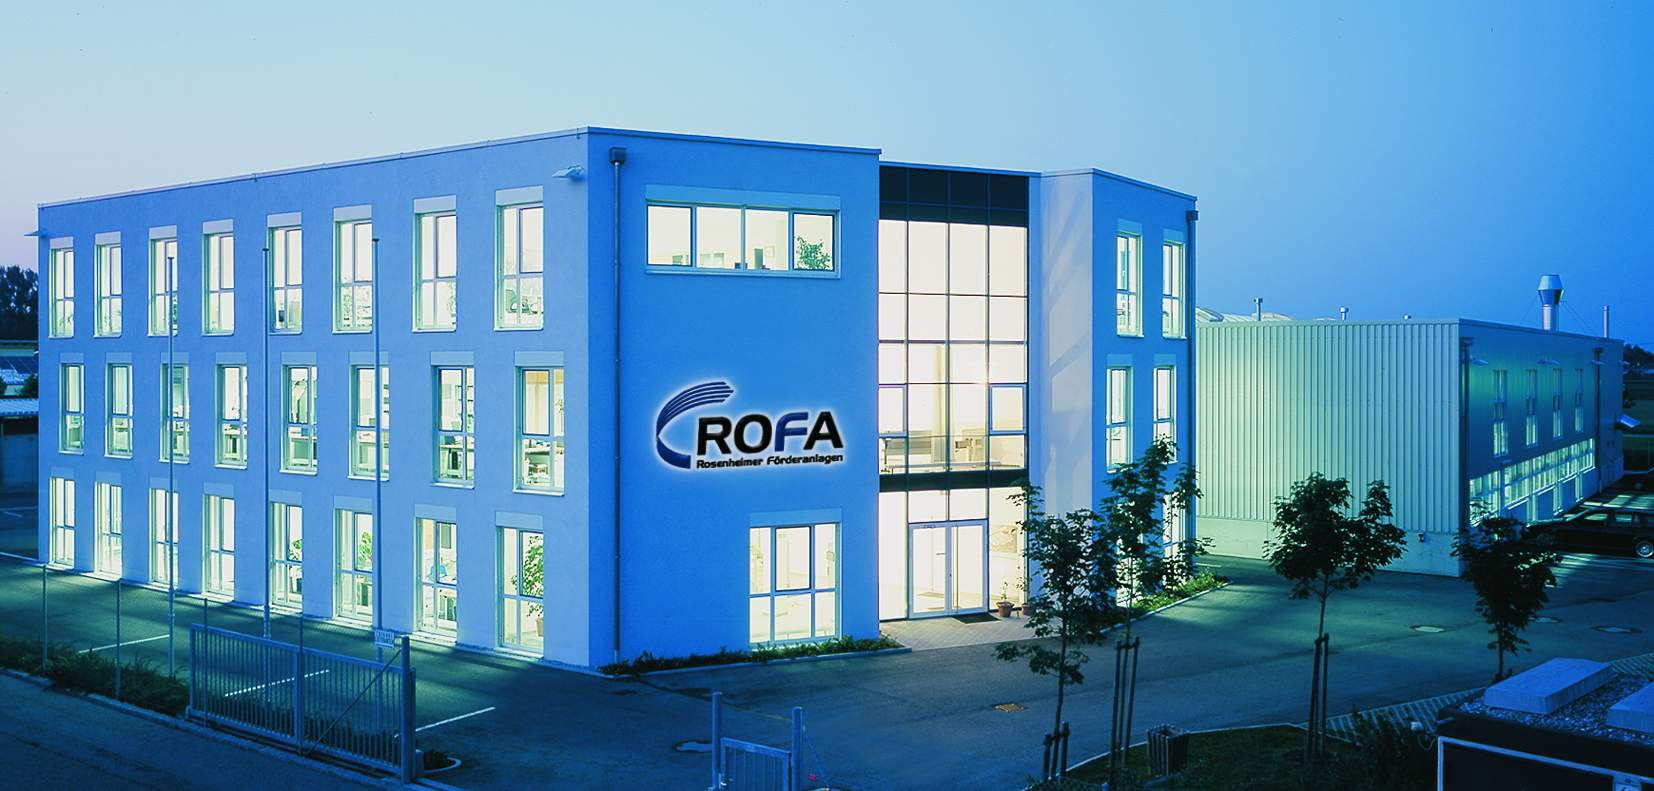 Referenz_Rofa Gebäude